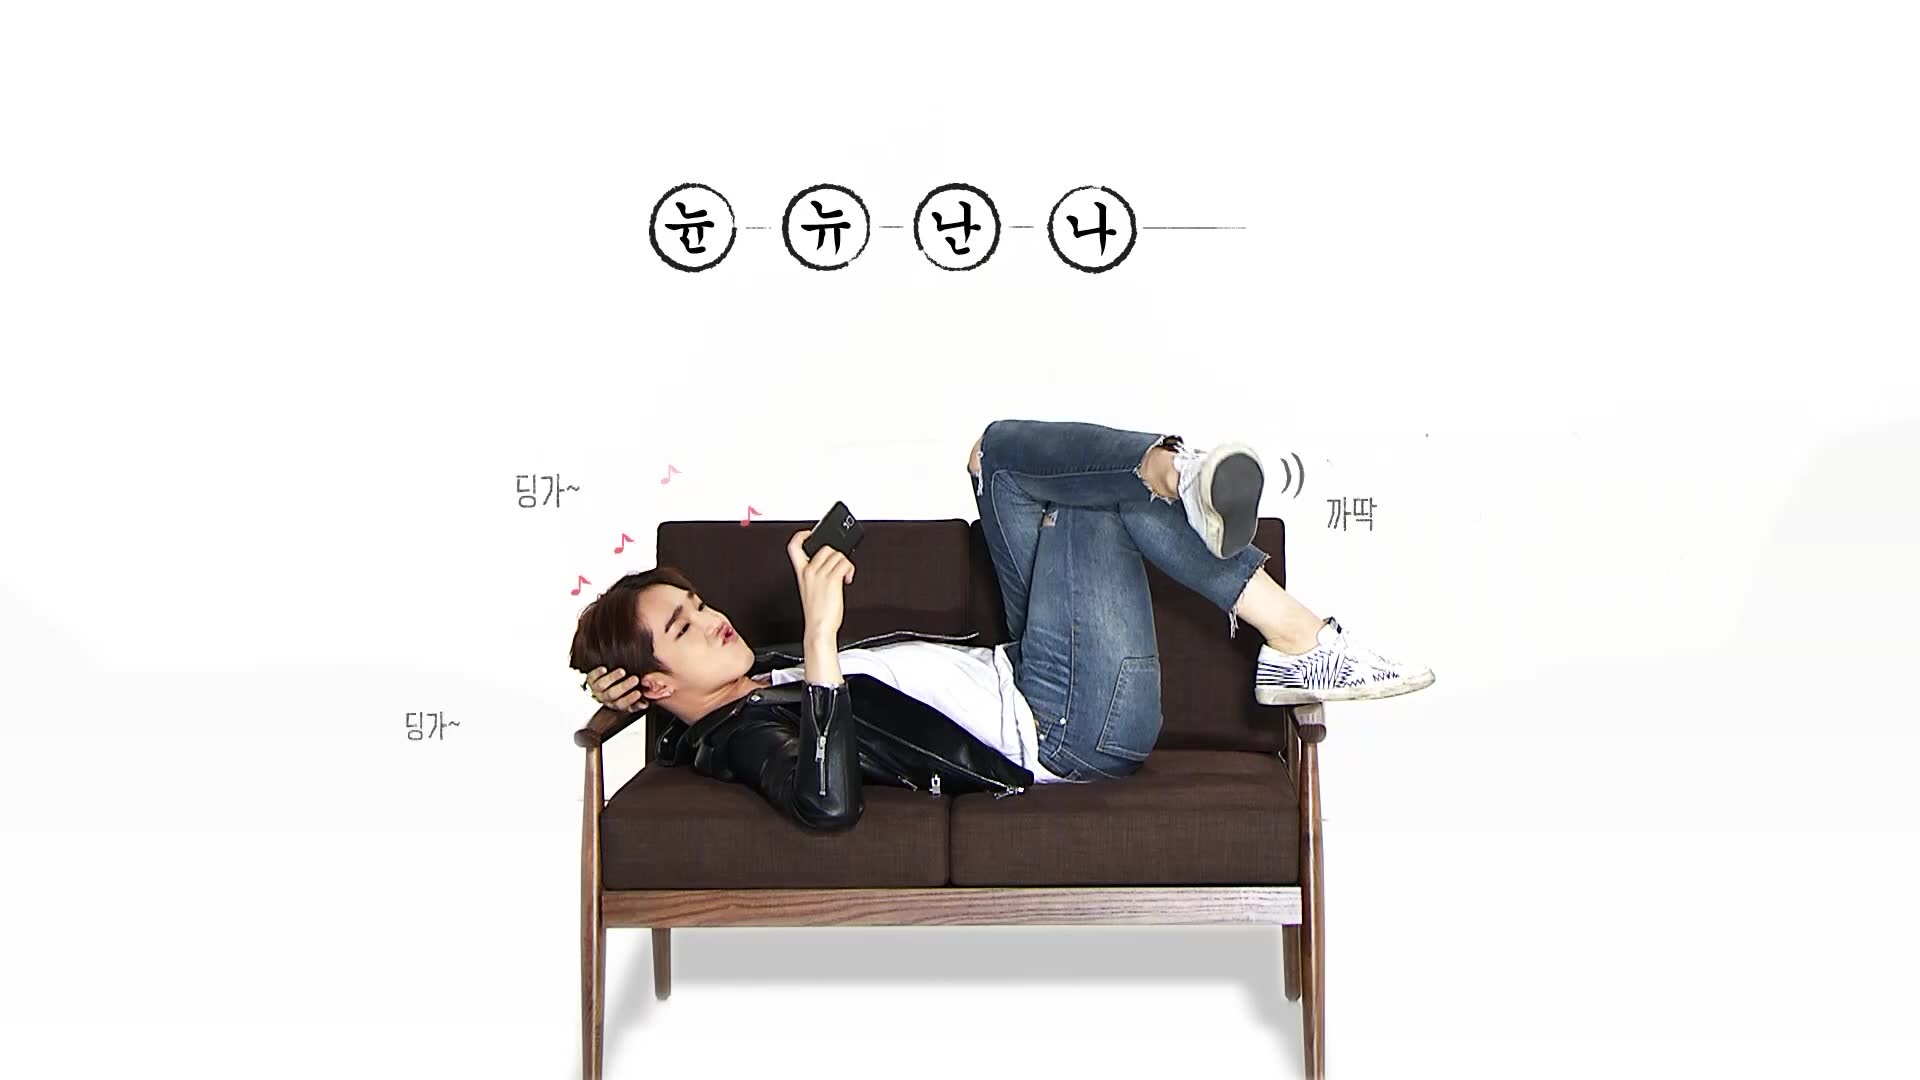 Nam Tae Hyun: Midnight's Girl - Garota da Meia-Noite